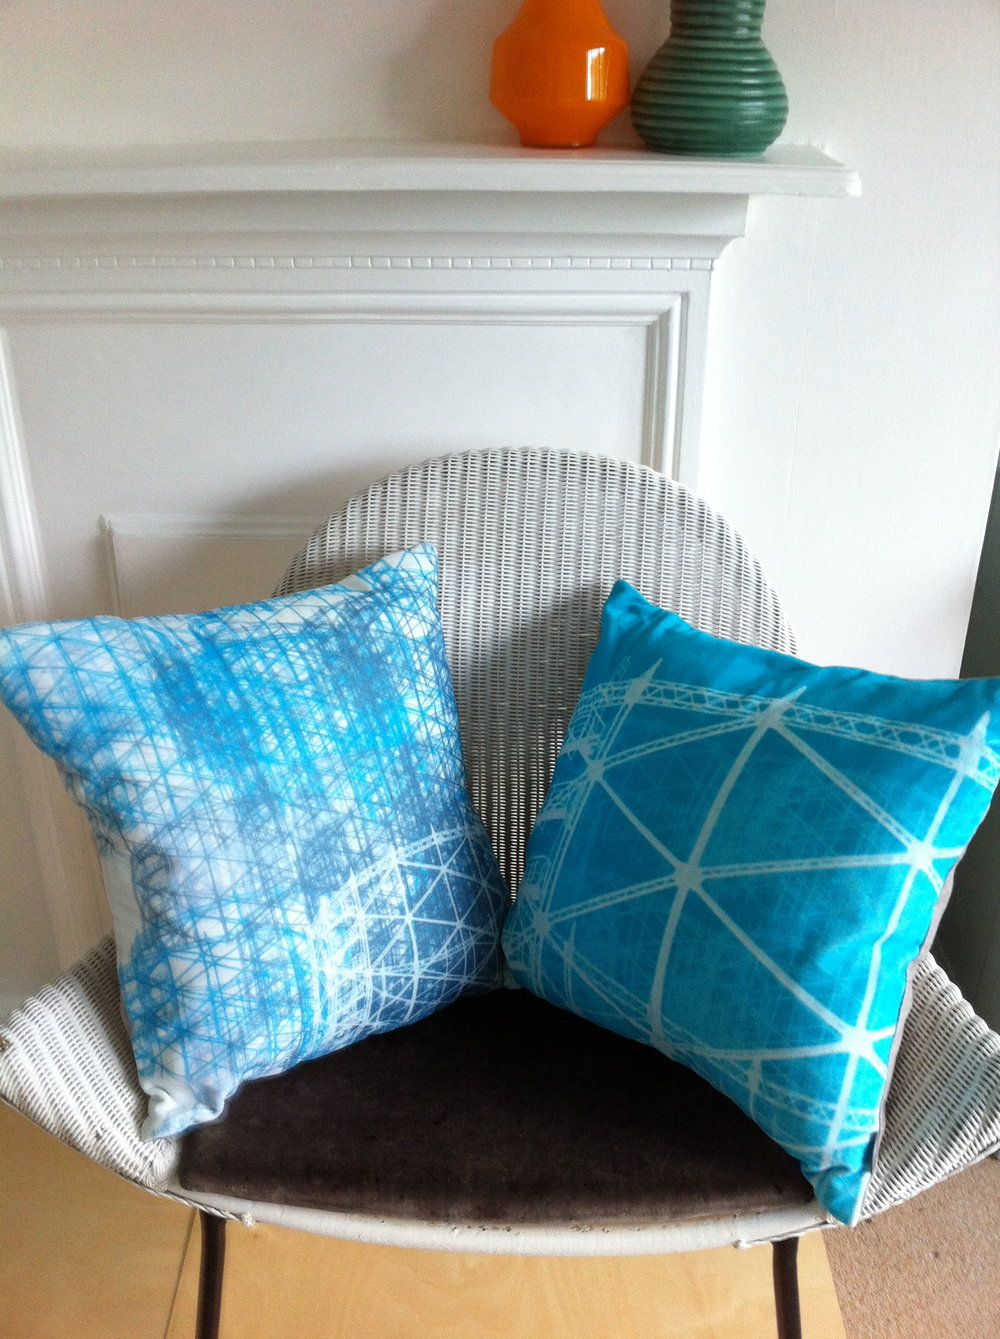 Jo angell 'Gasholder no1' cushions .jpg